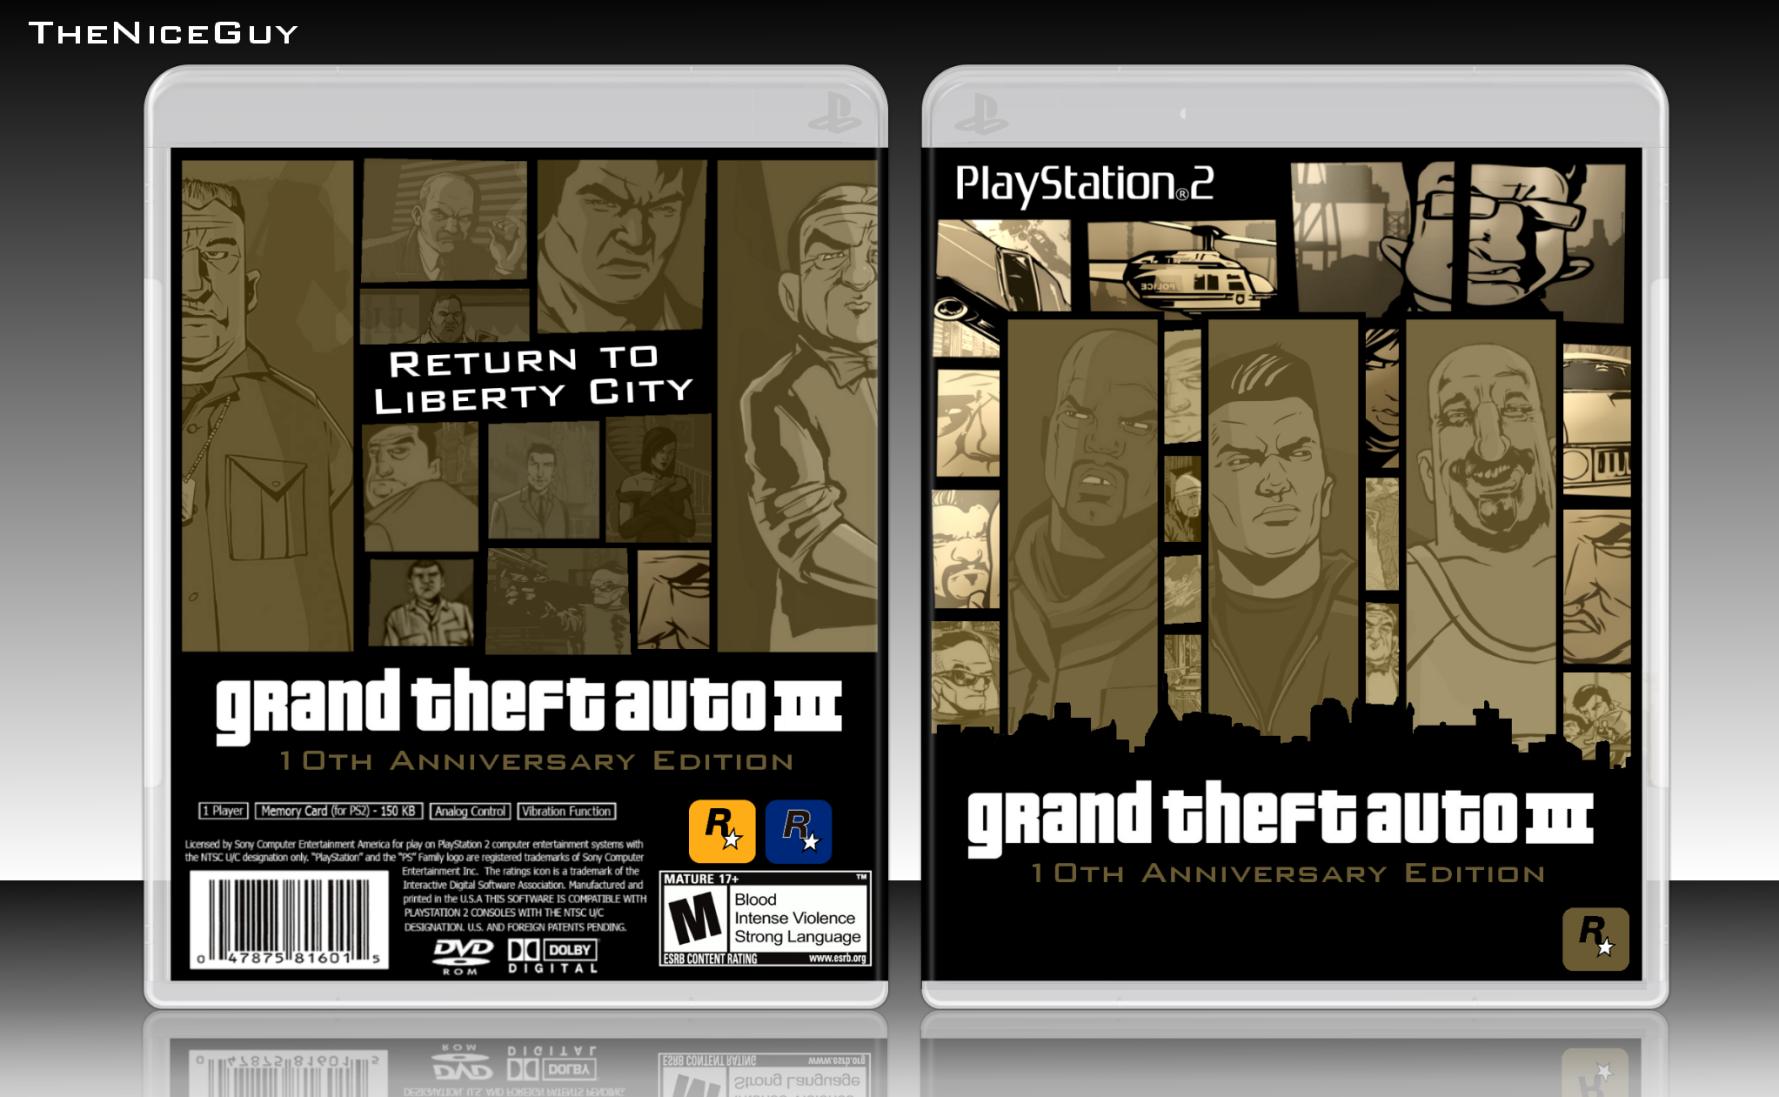 grand theft auto iii anniversary edition playstation 2 box